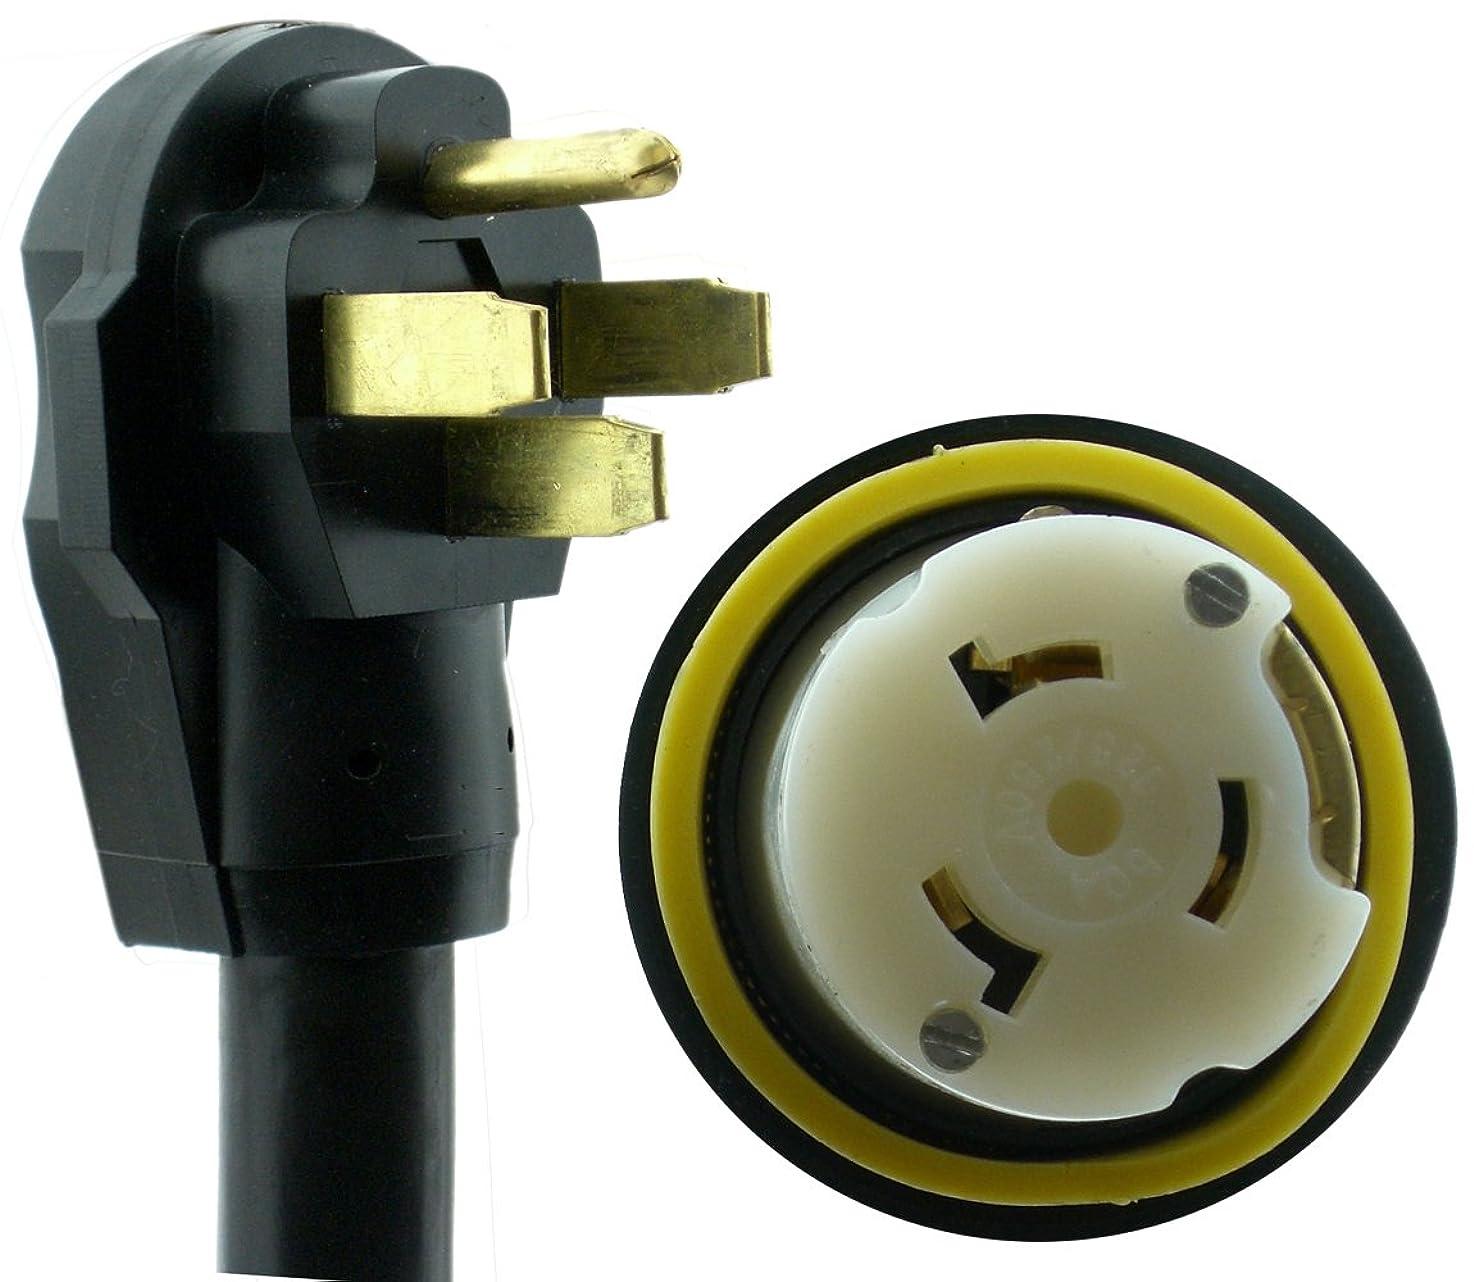 NU-CORD 94561M 50-Feet 50-Amp Rv Cord with Marine Locking Connector